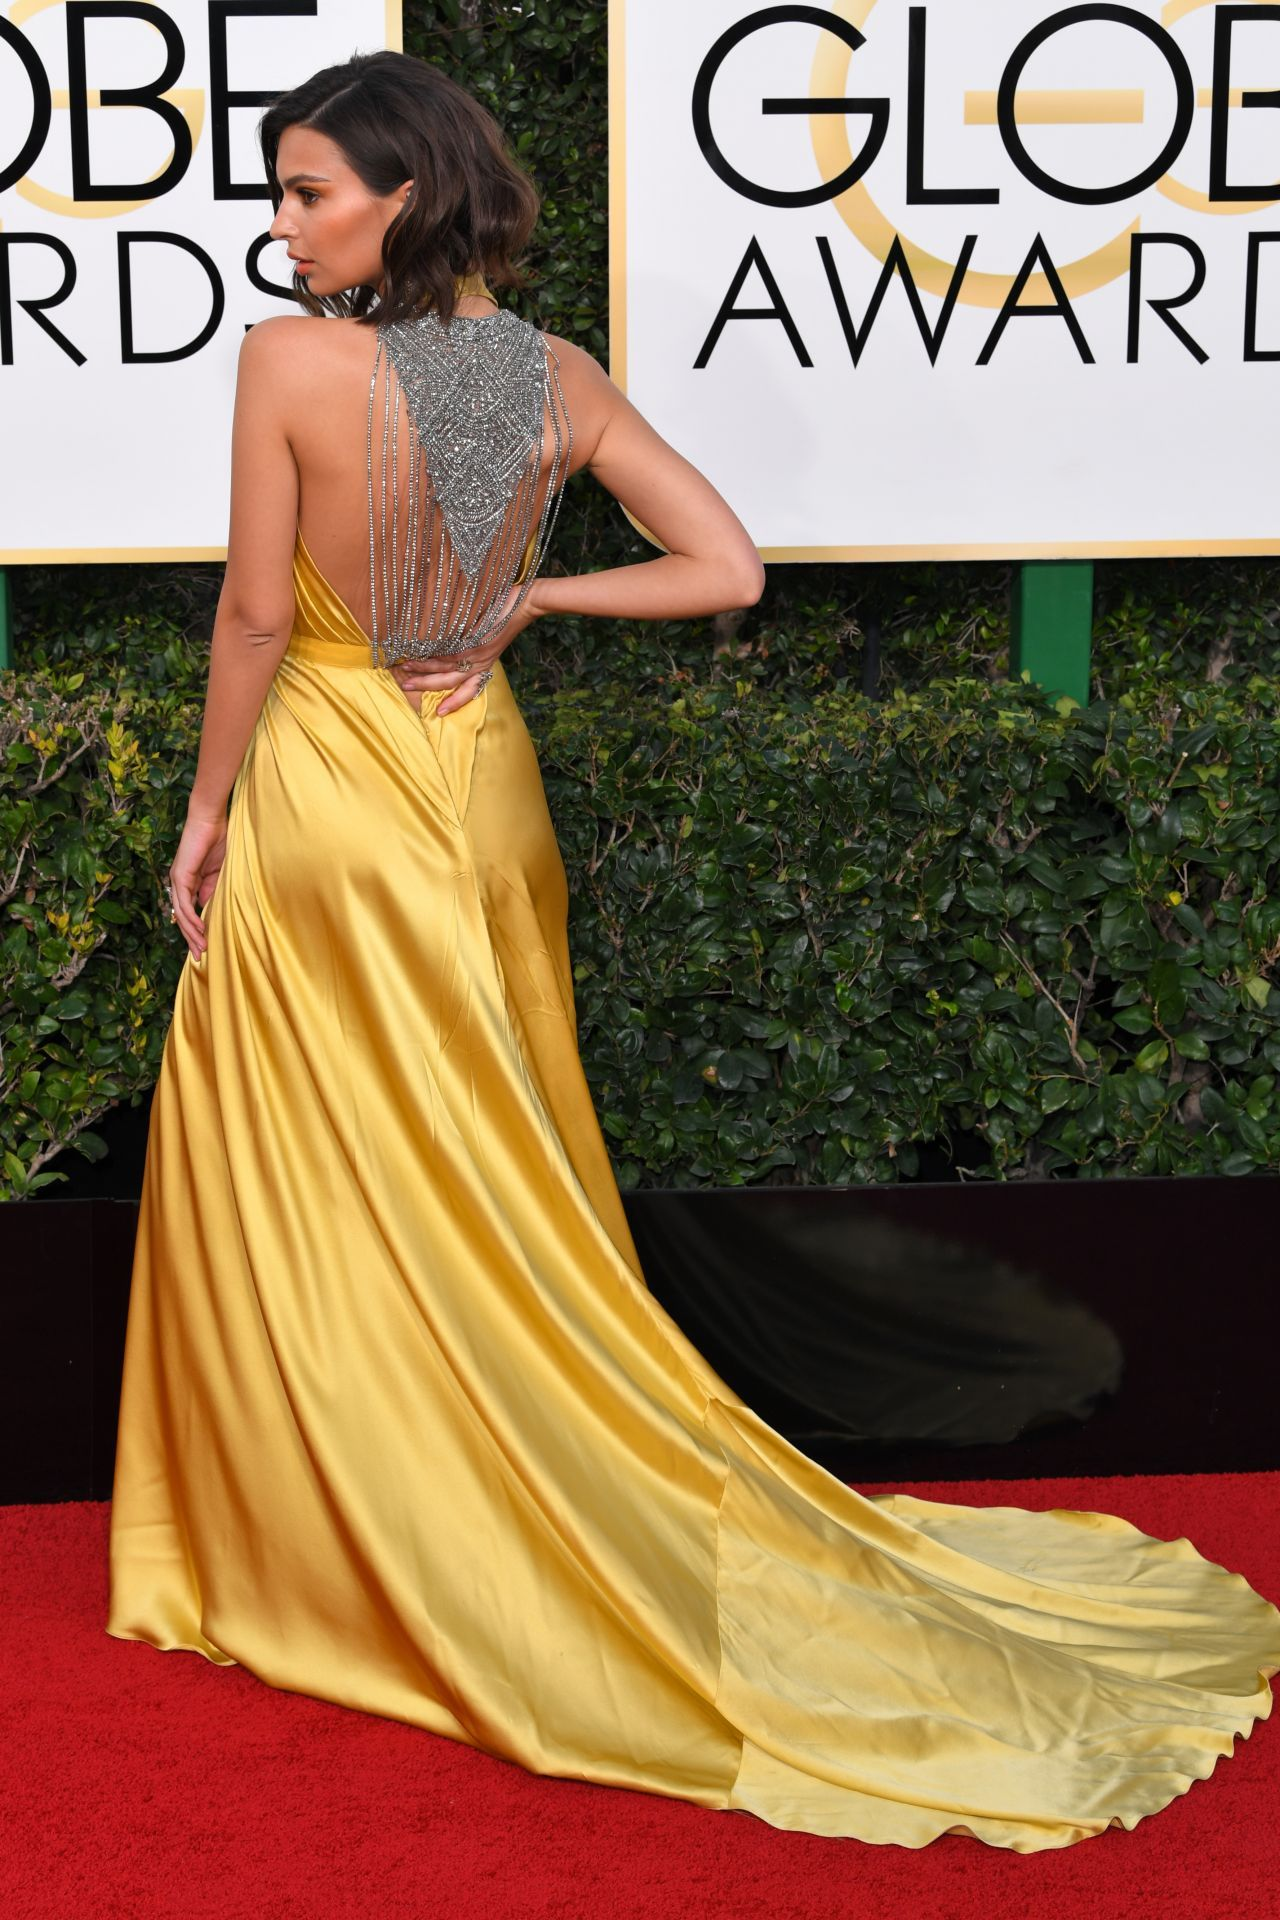 Emily Ratajkowski in Reem Acra at 2017 Golden Globe Awards in Beverly Hills Check more at http://fashnberry.com/2017/01/emily-ratajkowski-in-reem-acra-at-2017-golden-globe-awards-in-beverly-hills/